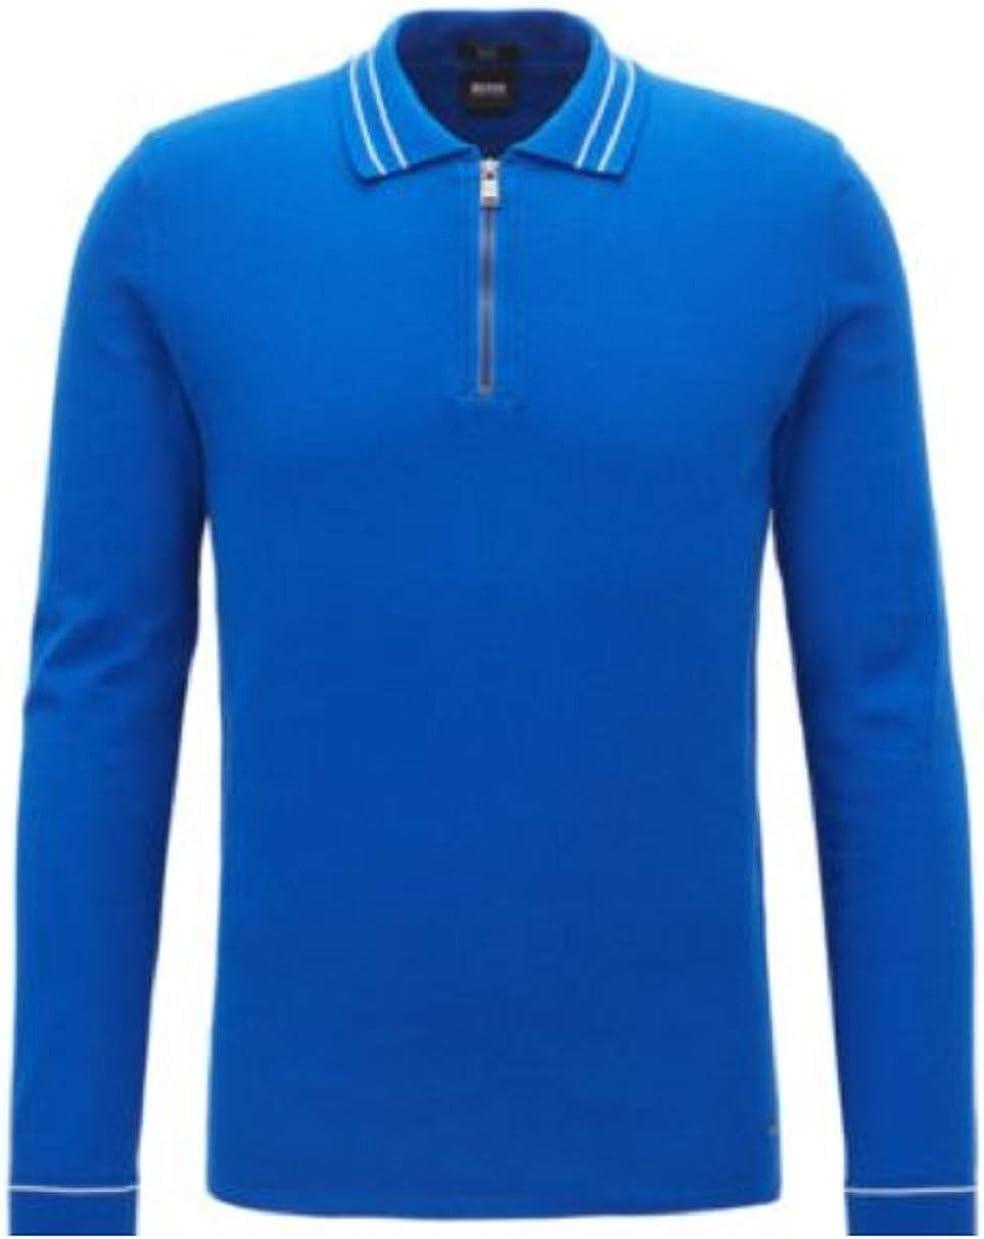 Hugo Boss Max 57% OFF Men's Royal Blue Zipper Polo Neck Fit Slim Sweater 5 ☆ popular